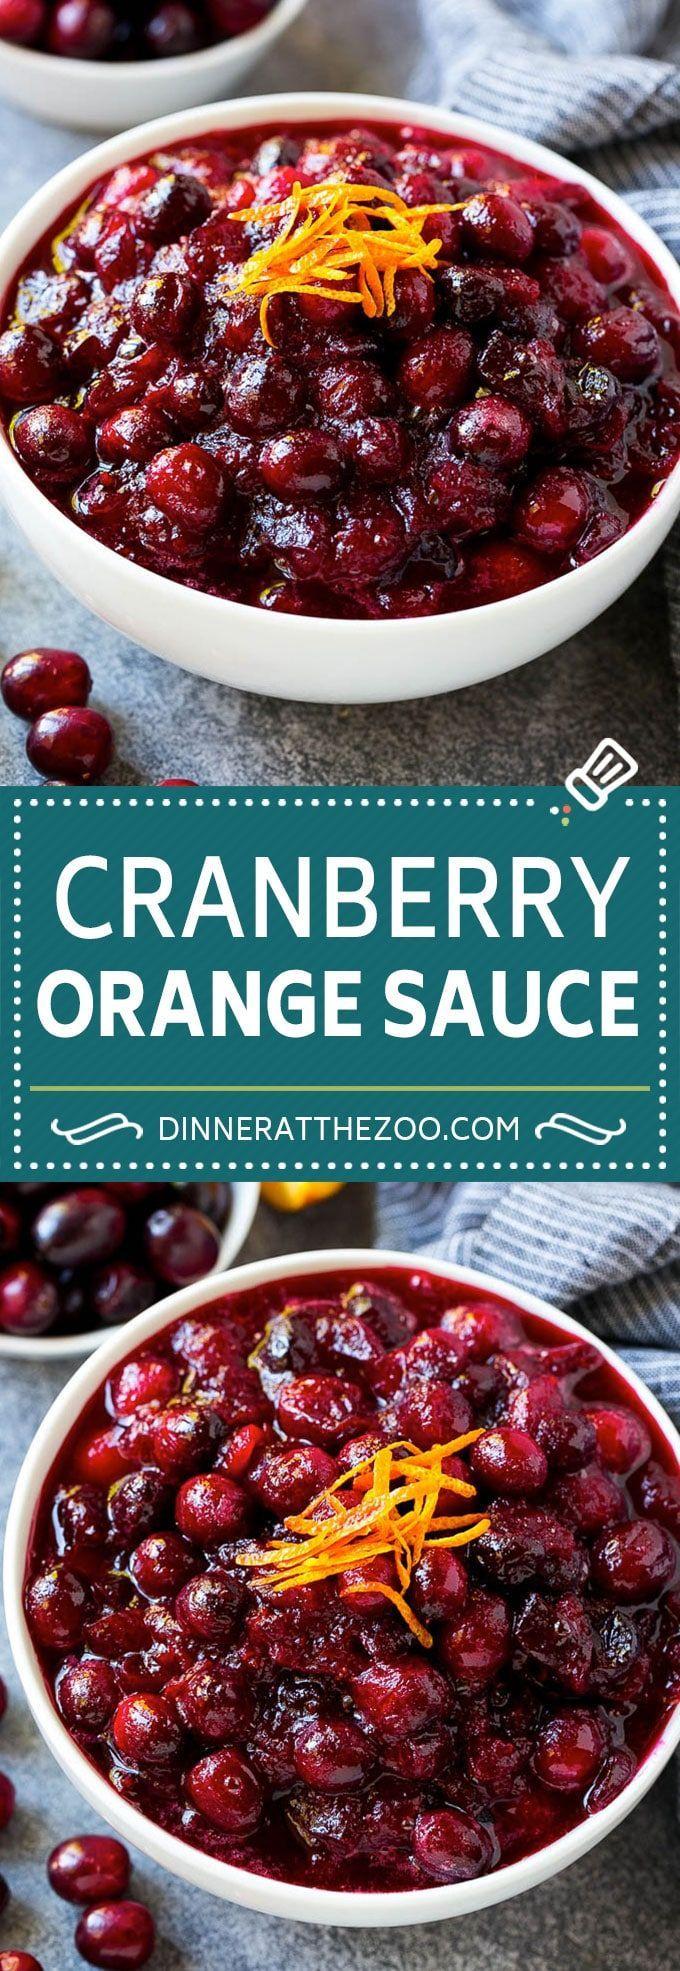 Cranberry Orange Sauce Recipe | Homemade Cranberry Sauce | Fresh Cranberry Sauce #cranberry #orange #fall #thanksgiving #sauce #dinner #dinneratthezoo #thanksgivingrecipes